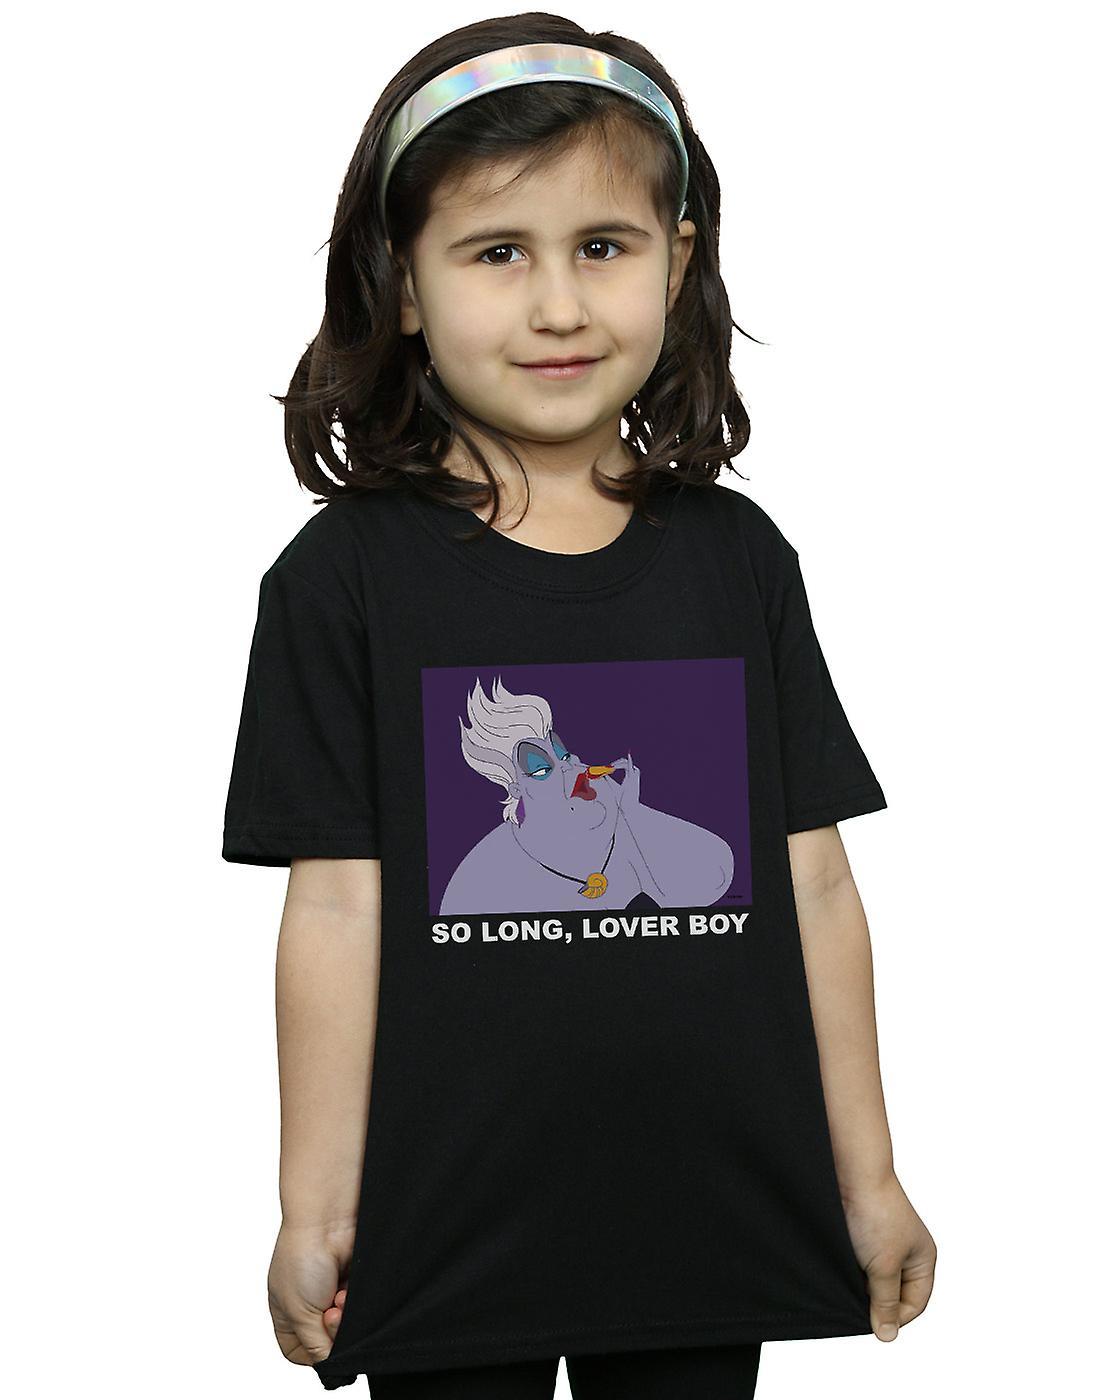 Disney Girls The Little Mermaid Ursula Lover Boy T-Shirt